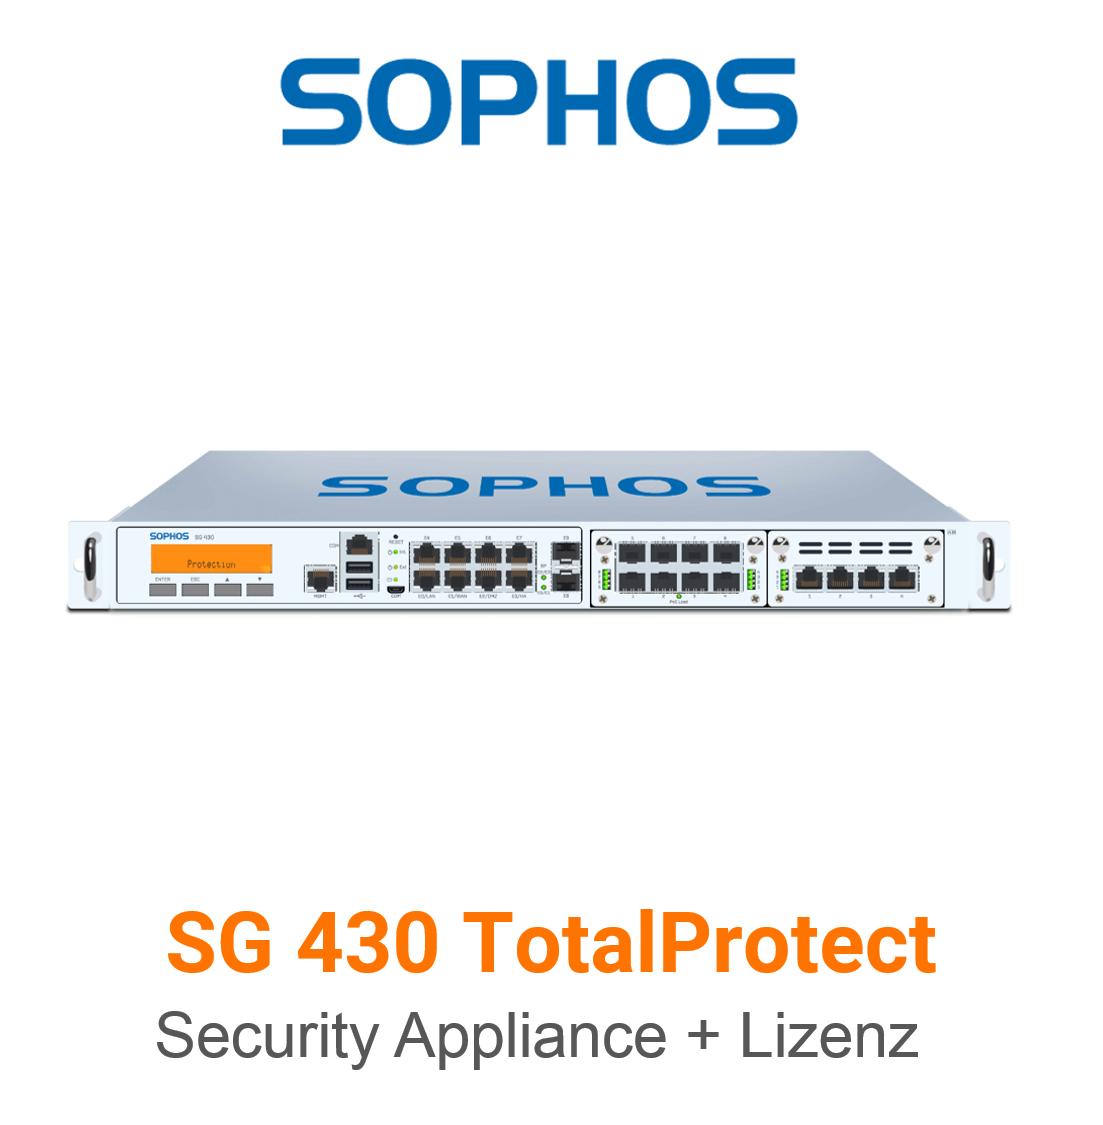 Sophos SG 430 TotalProtect Bundle (Hardware + Lizenz)